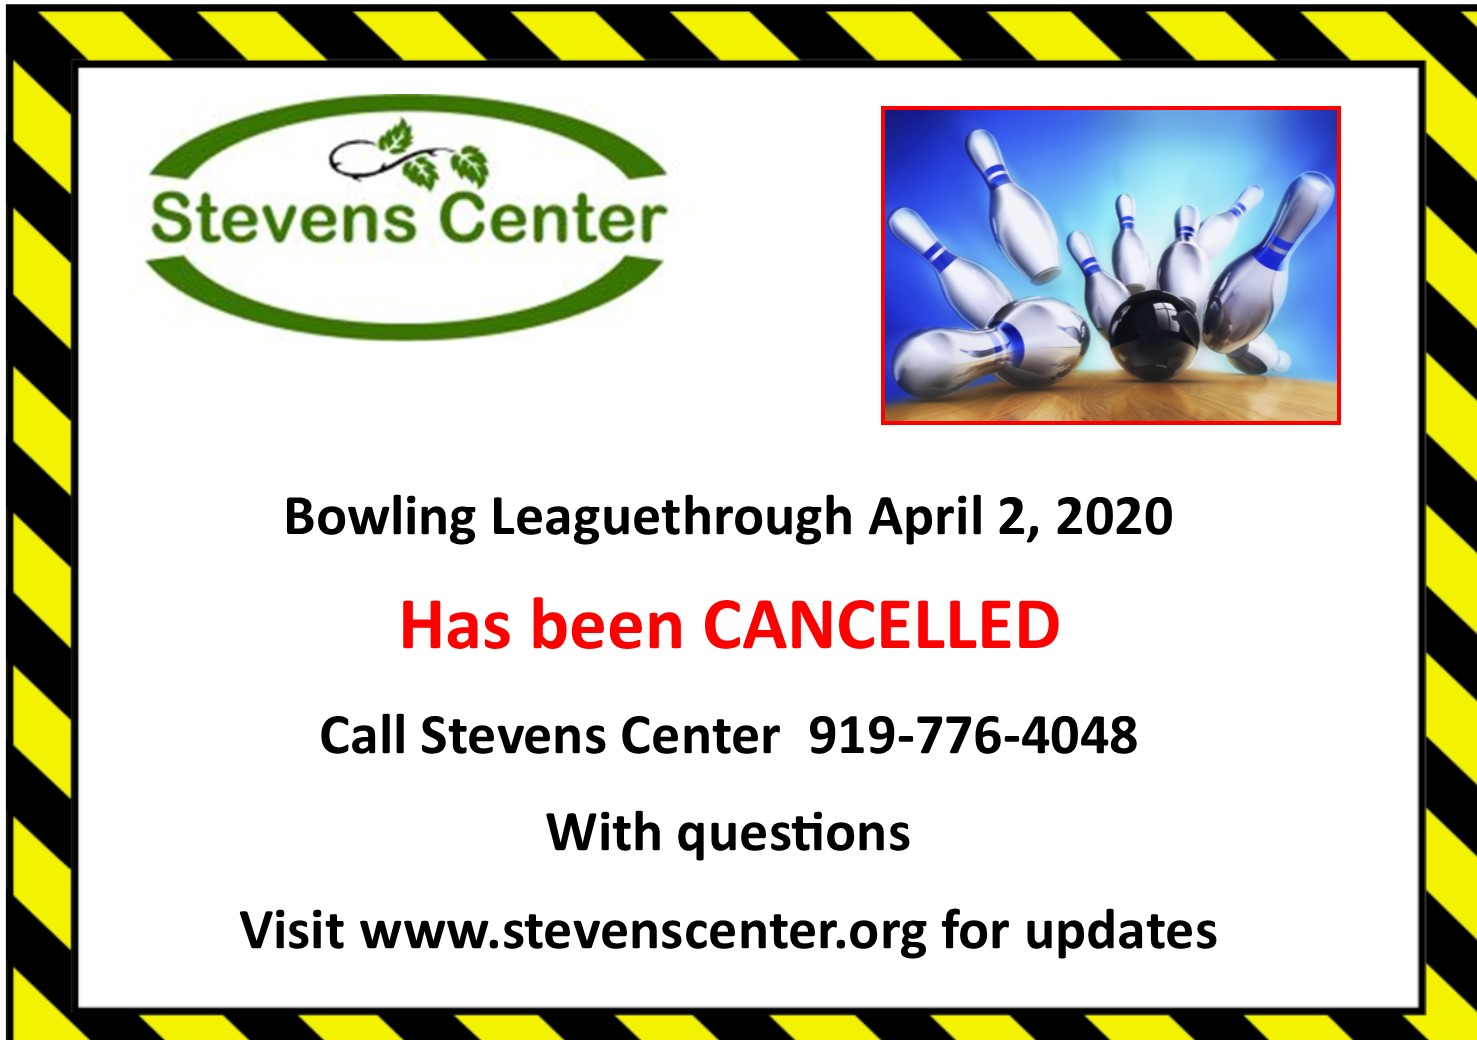 Bowling League cancelled